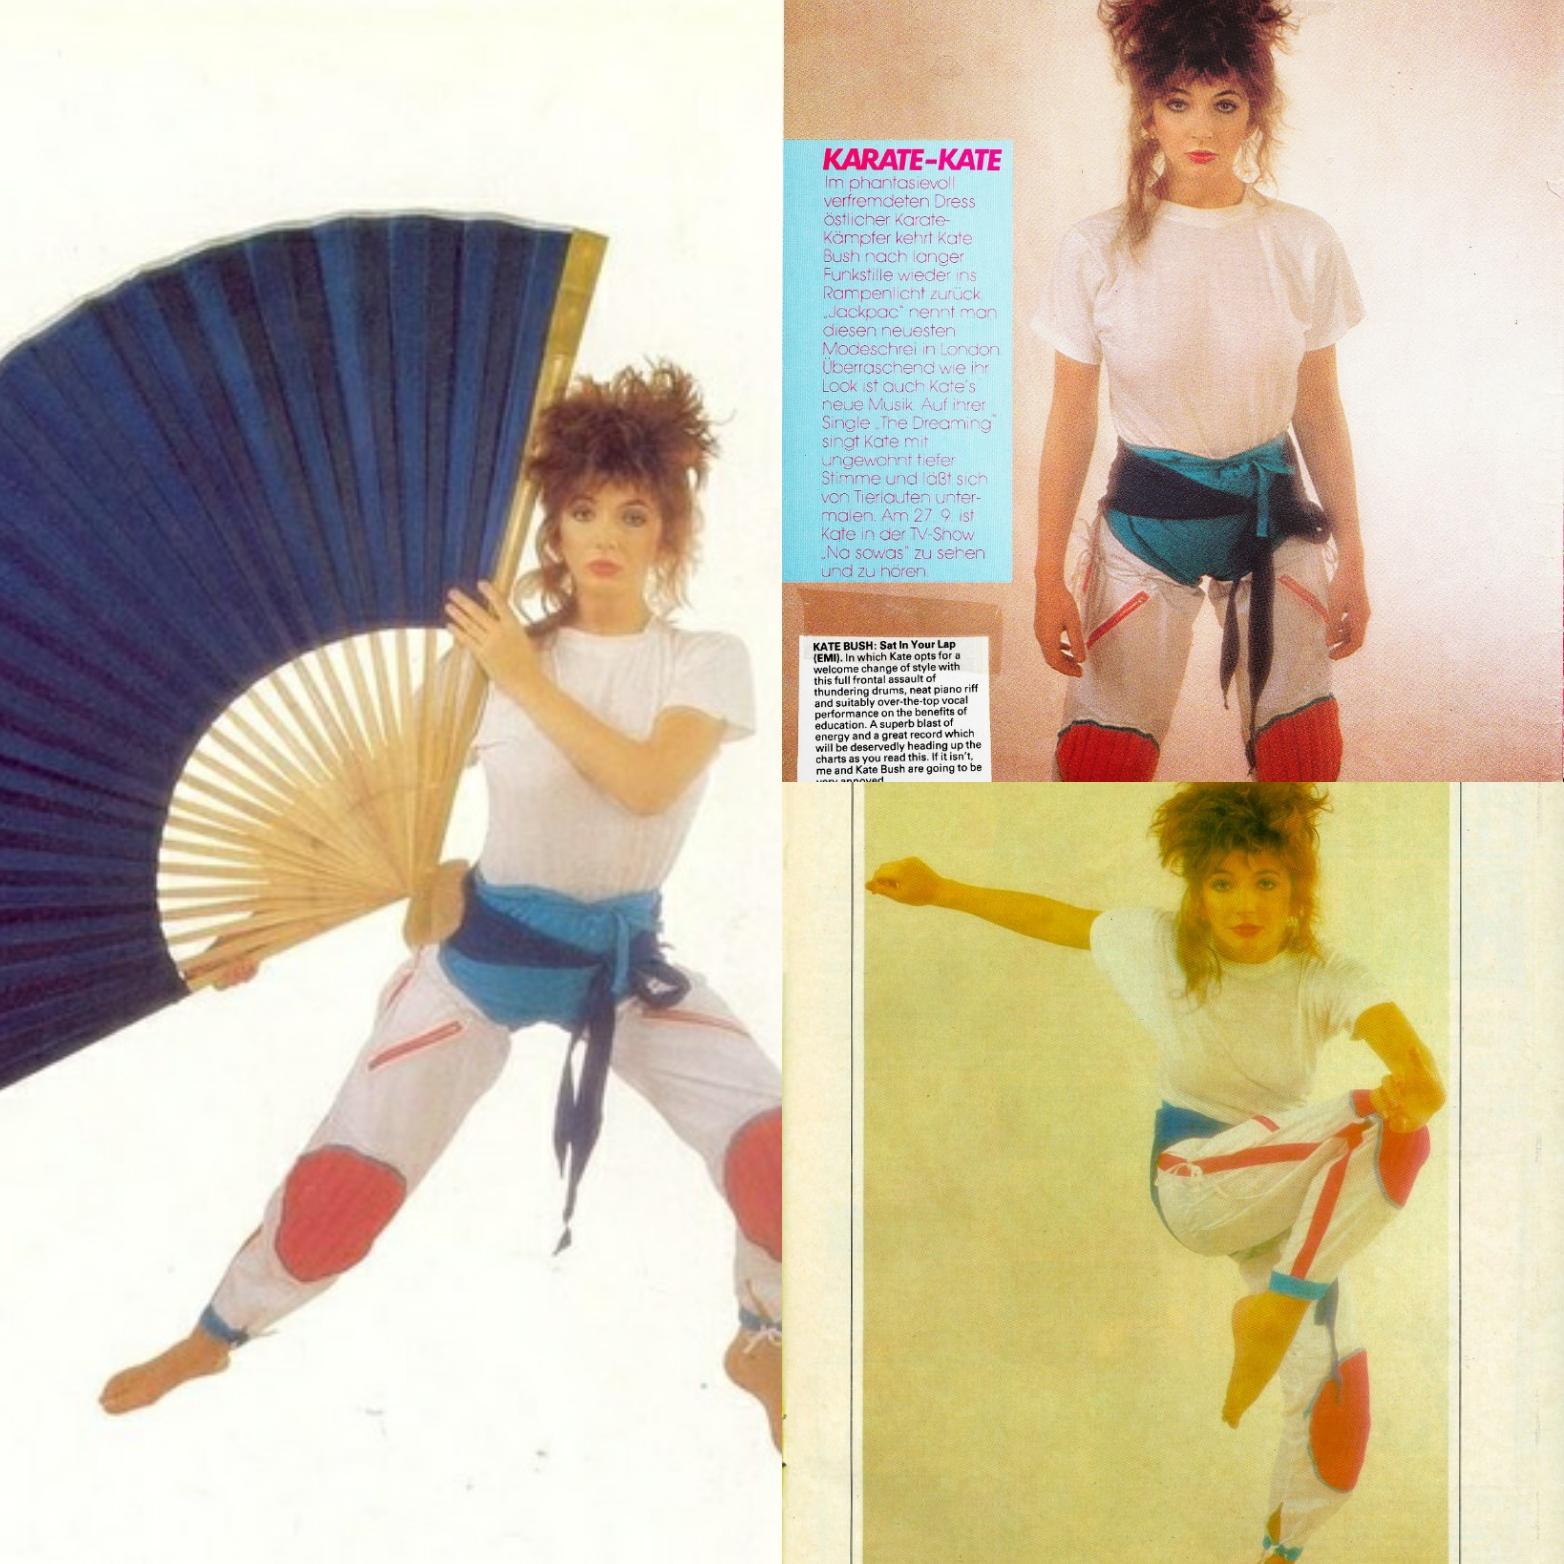 KarateKate.jpg